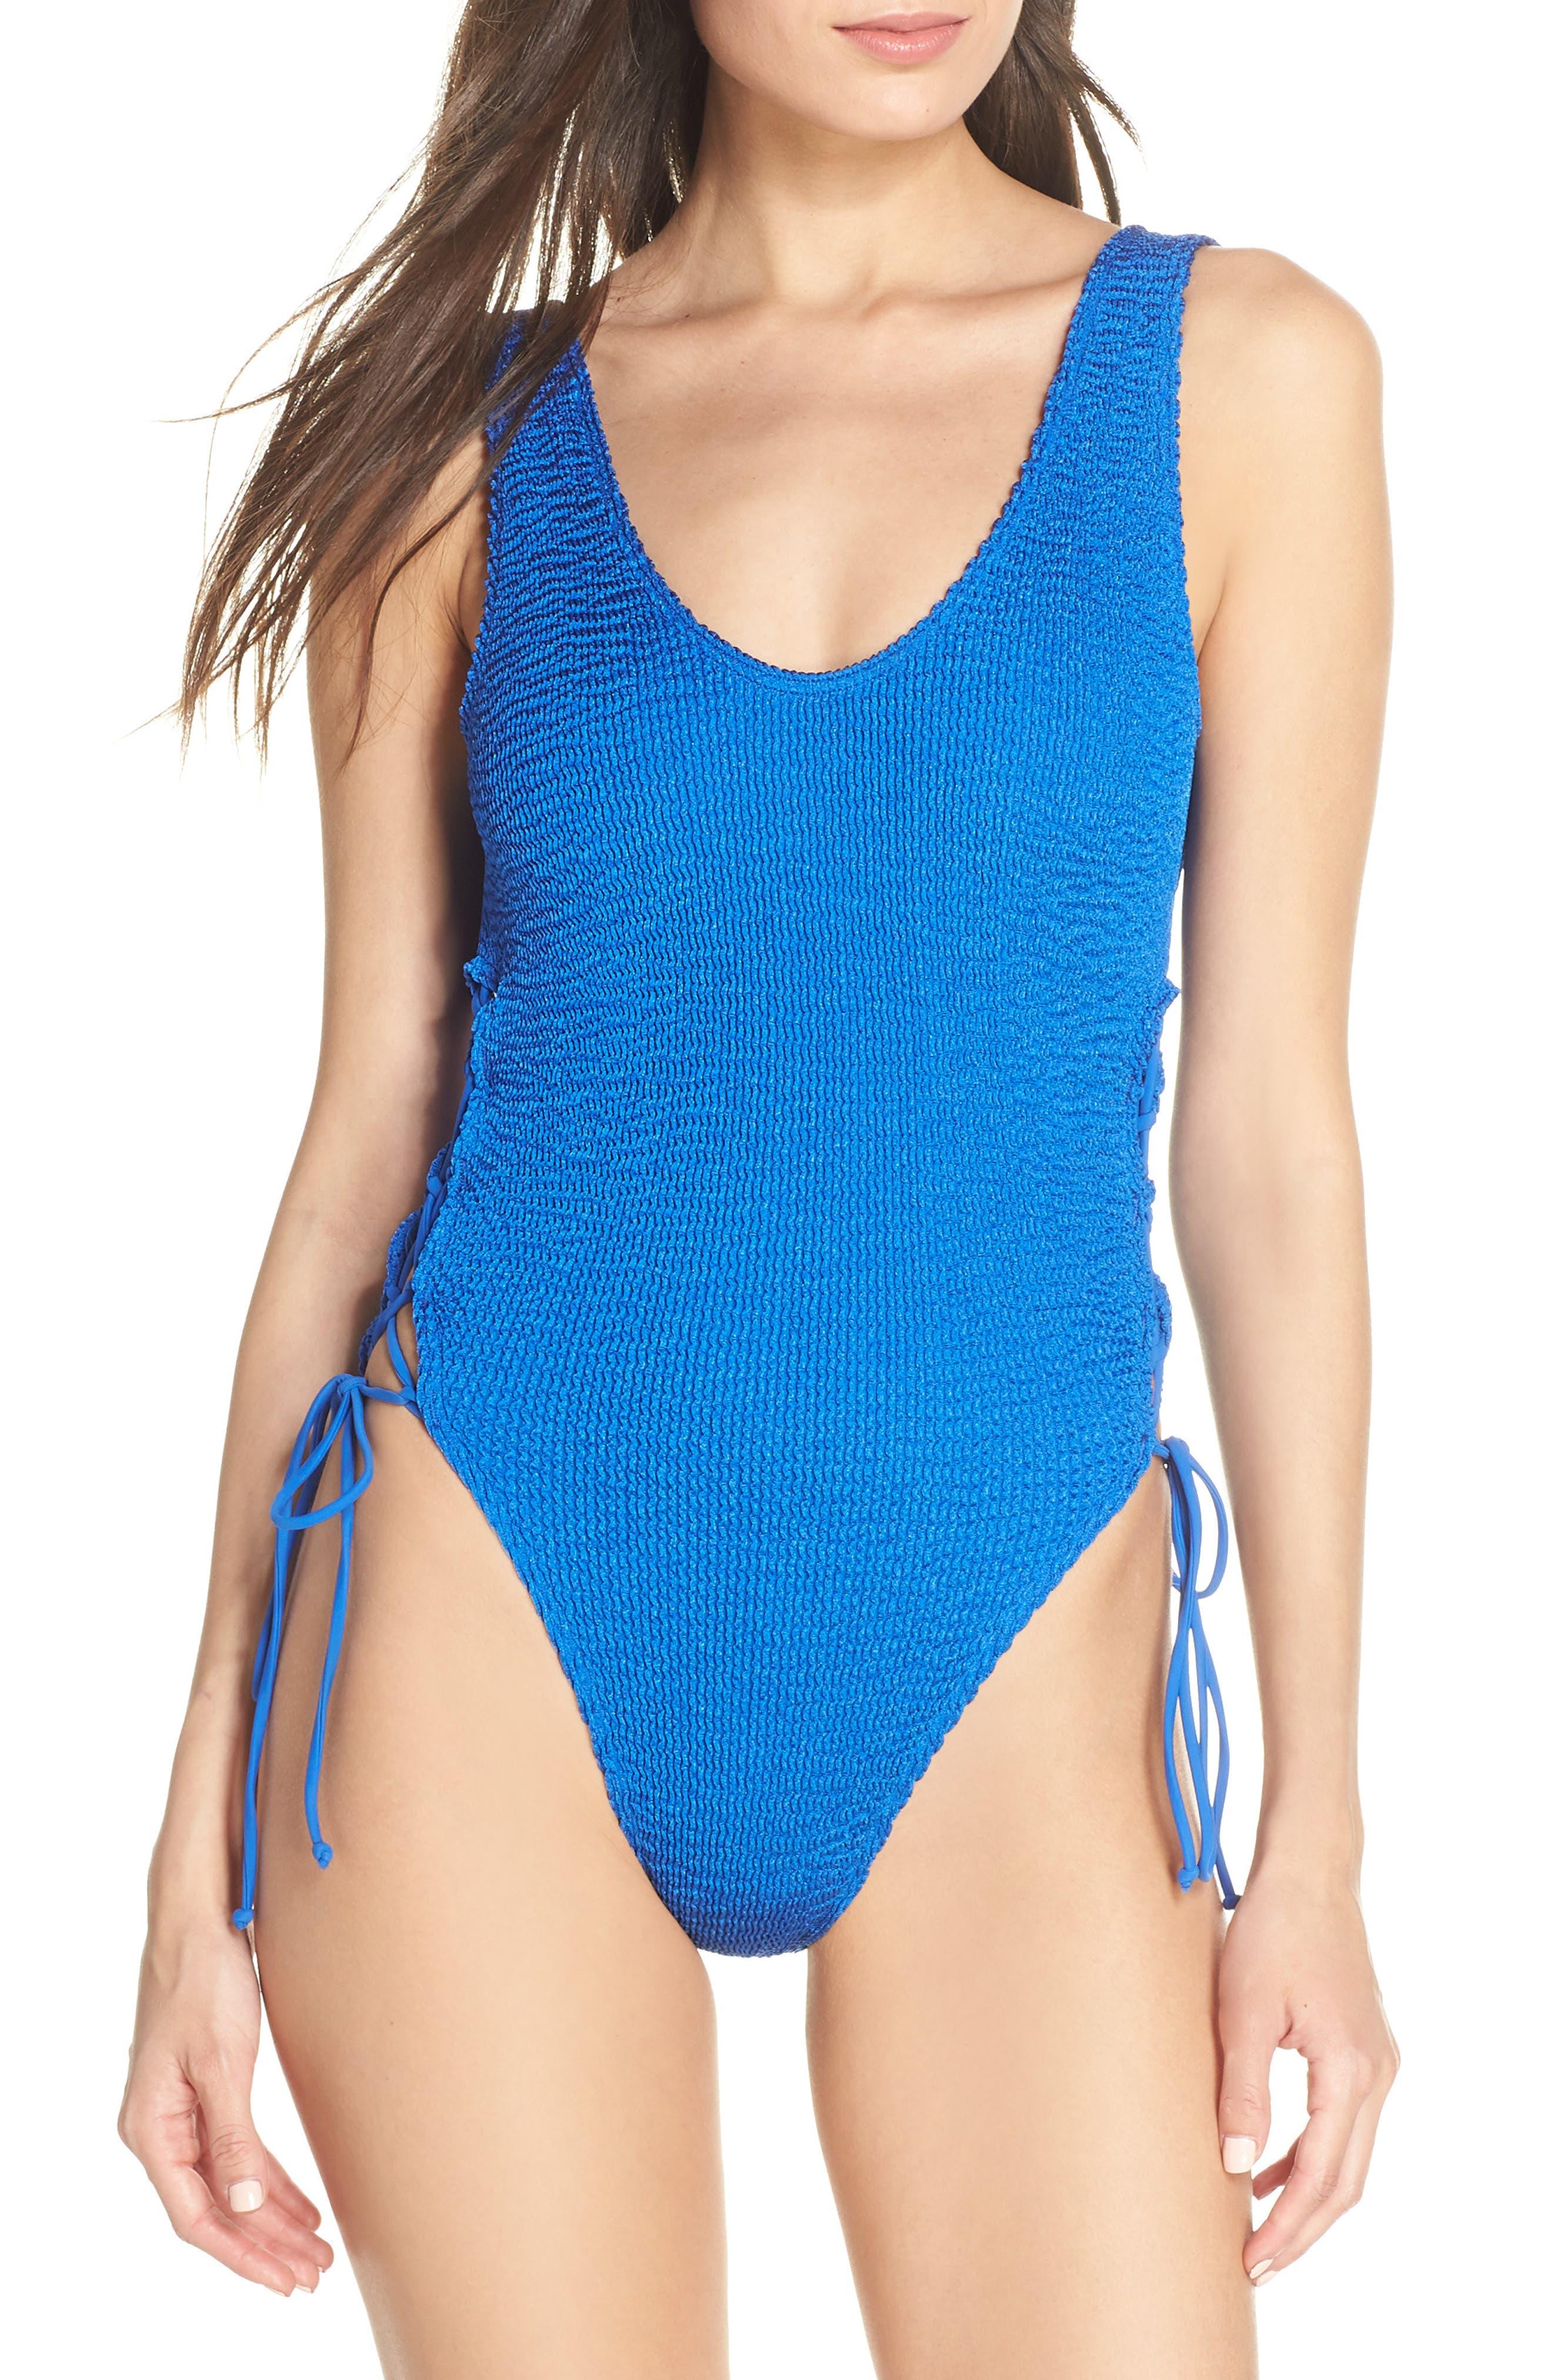 Bound By Bond-Eye The Margot One-Piece Swimsuit